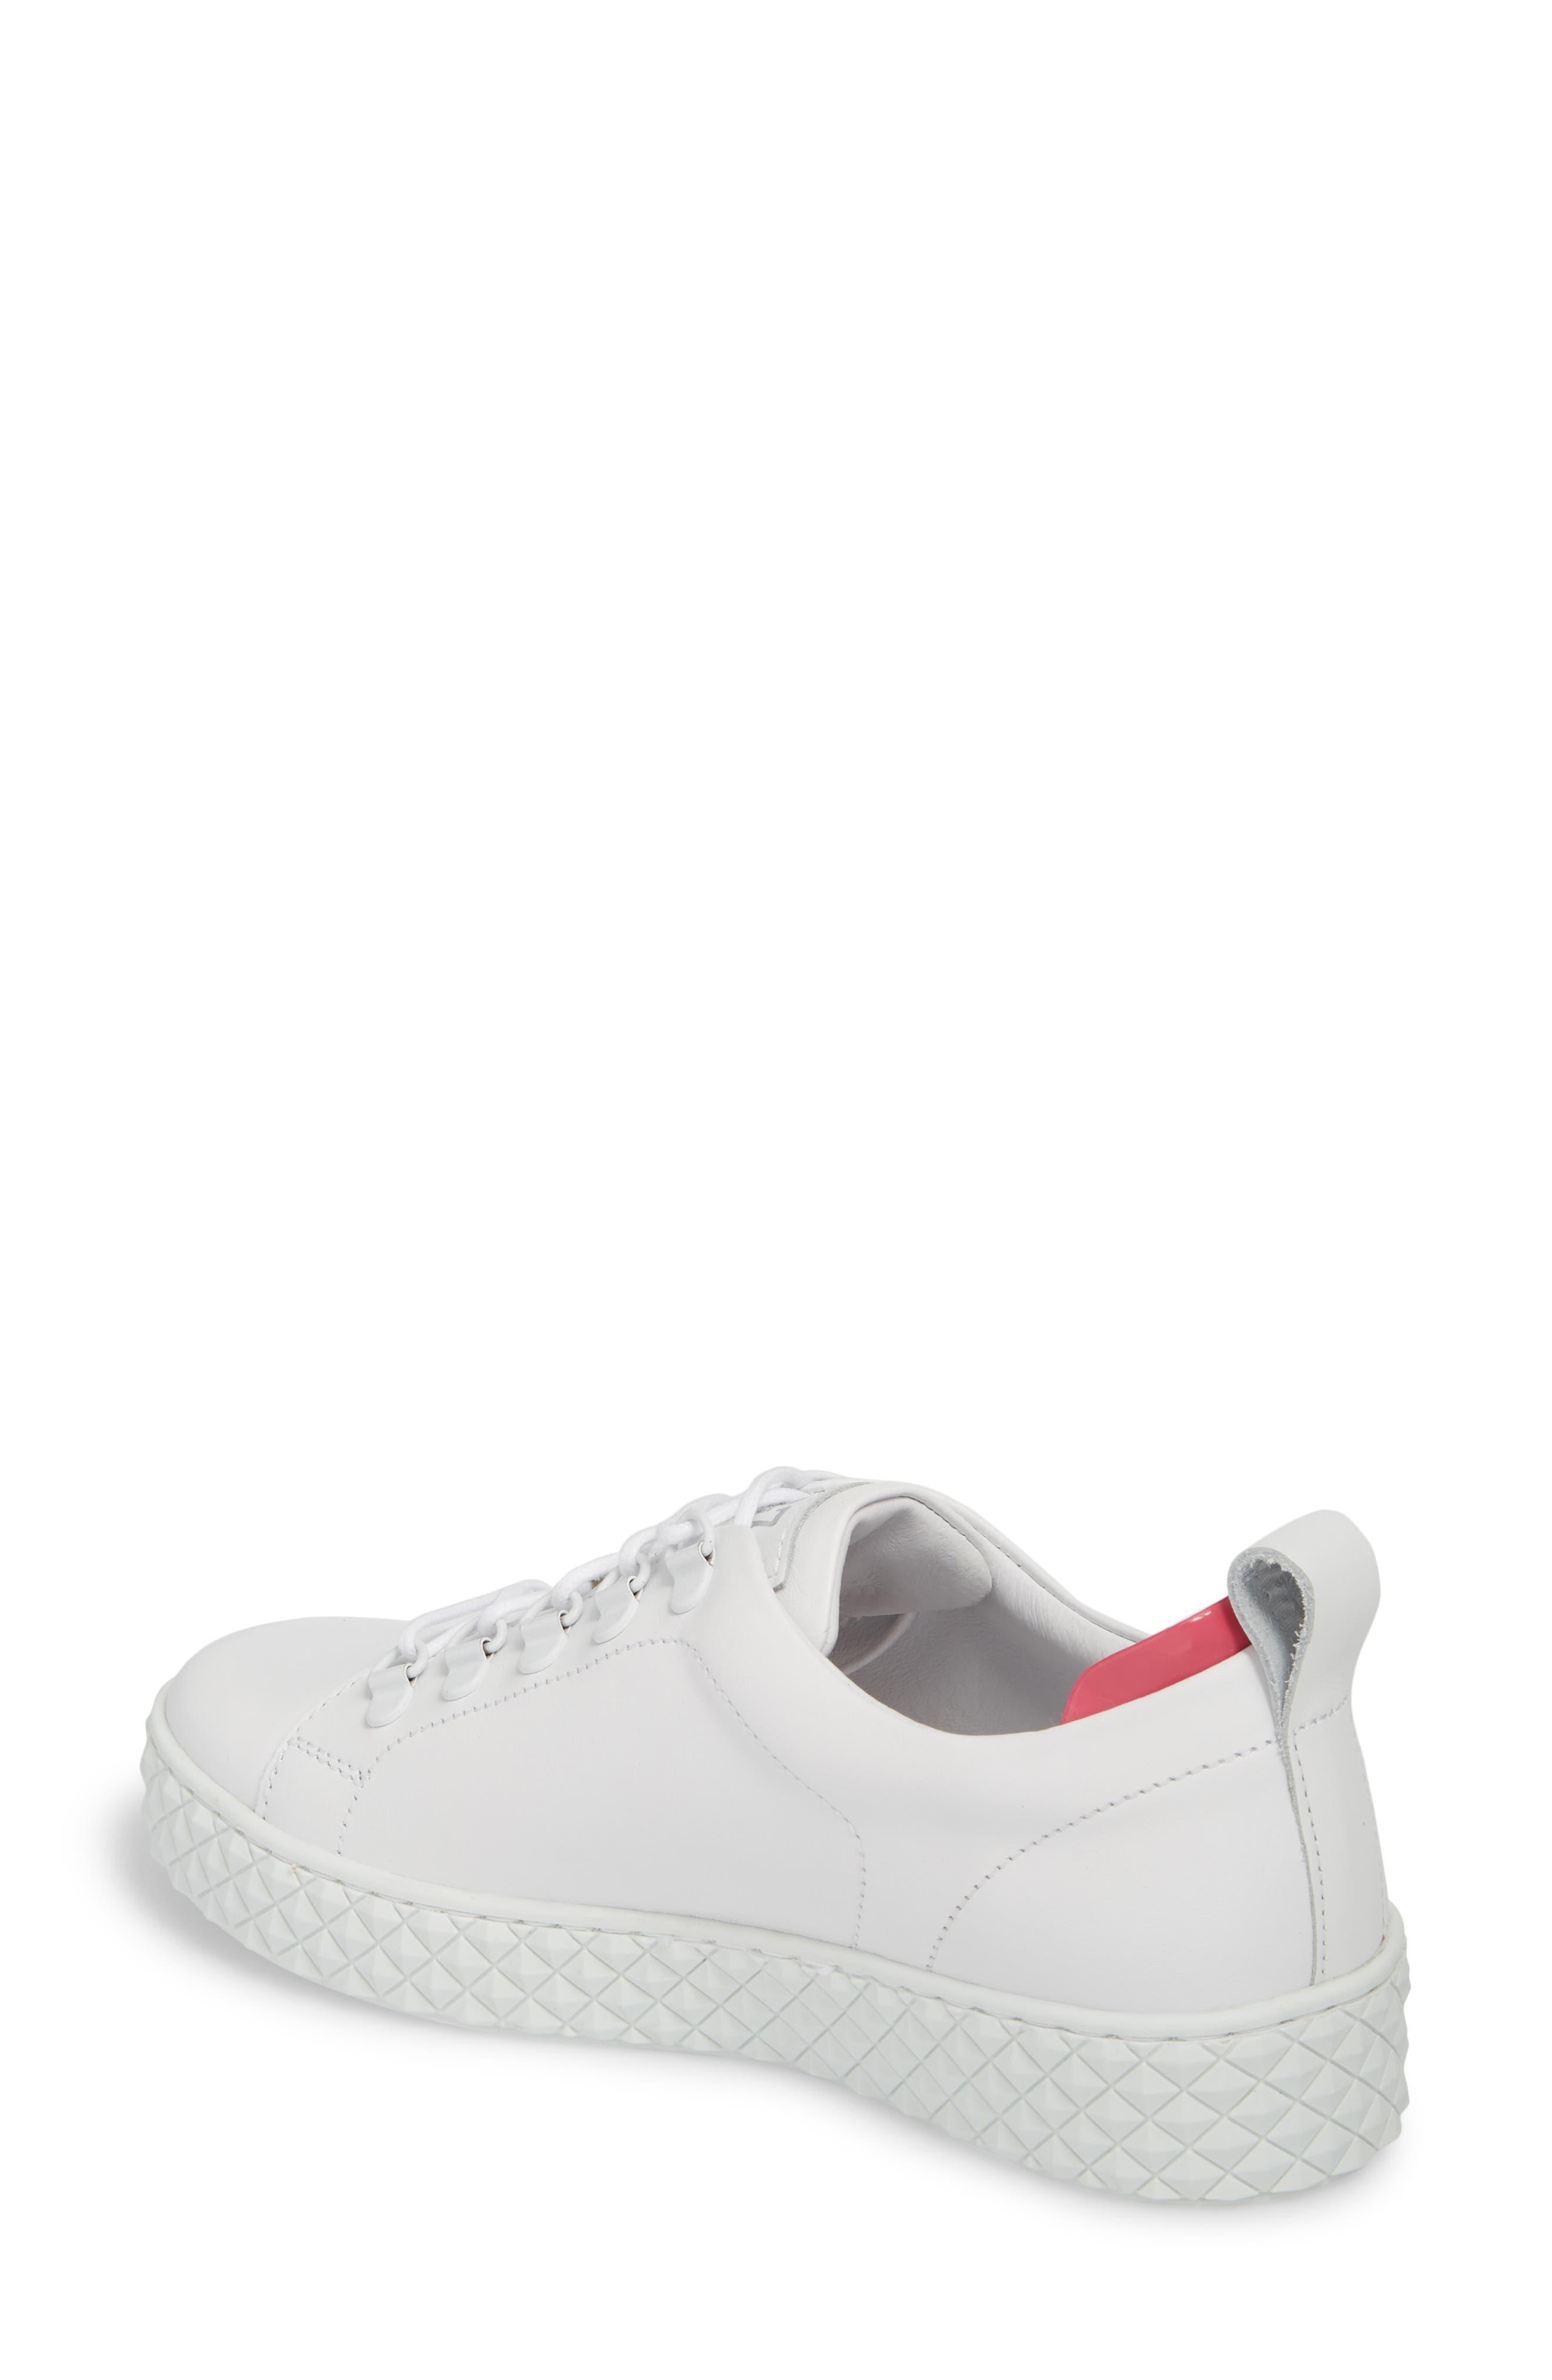 Sol Sneaker,                             Alternate thumbnail 2, color,